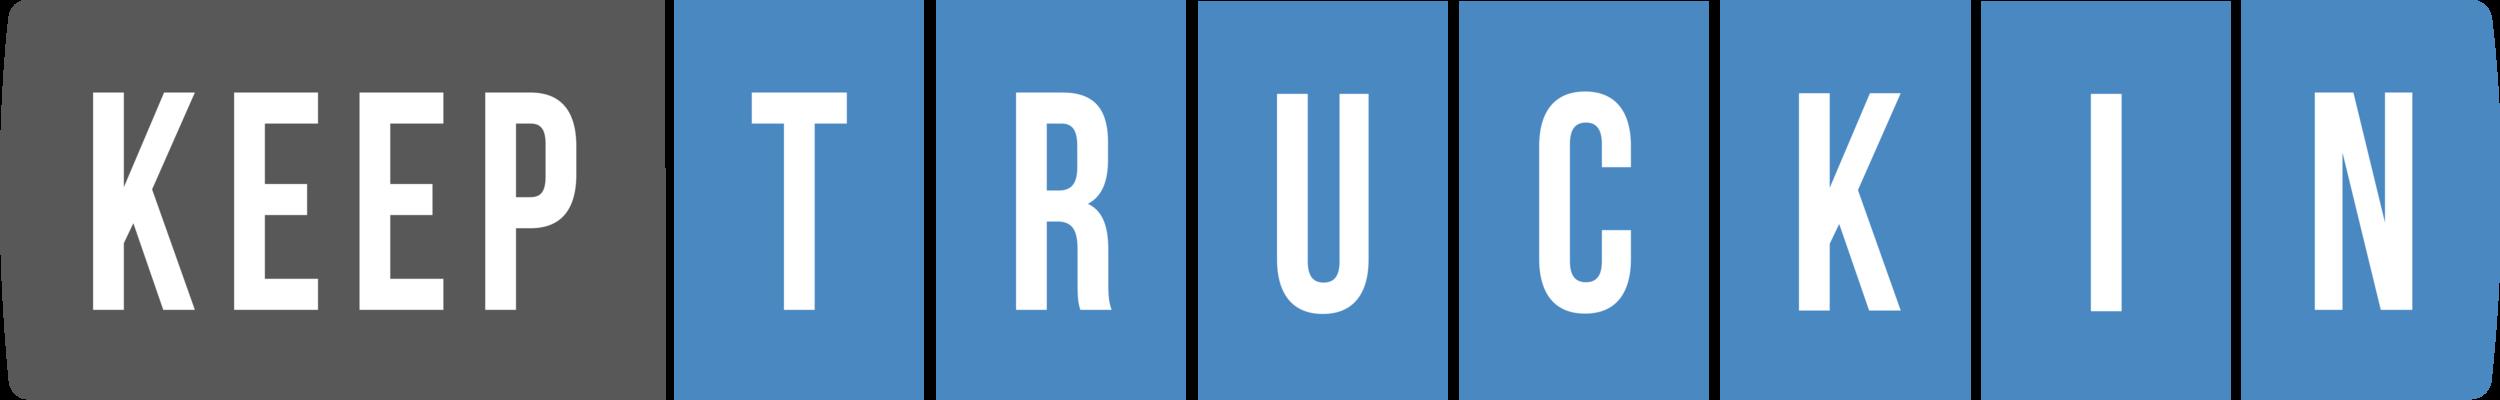 KeepTruckin-logo.png